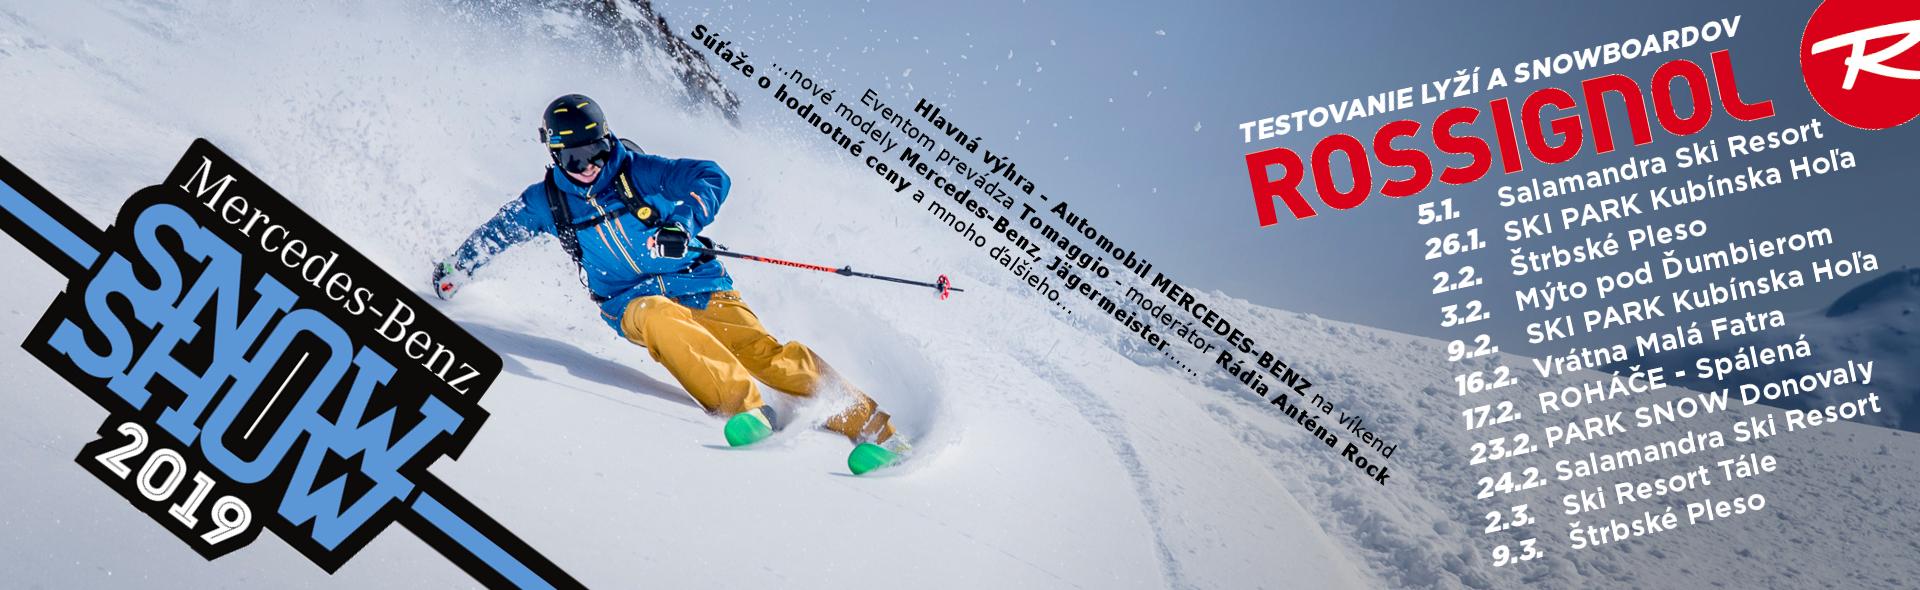 2_kalnedar_snowshow_1819.jpg